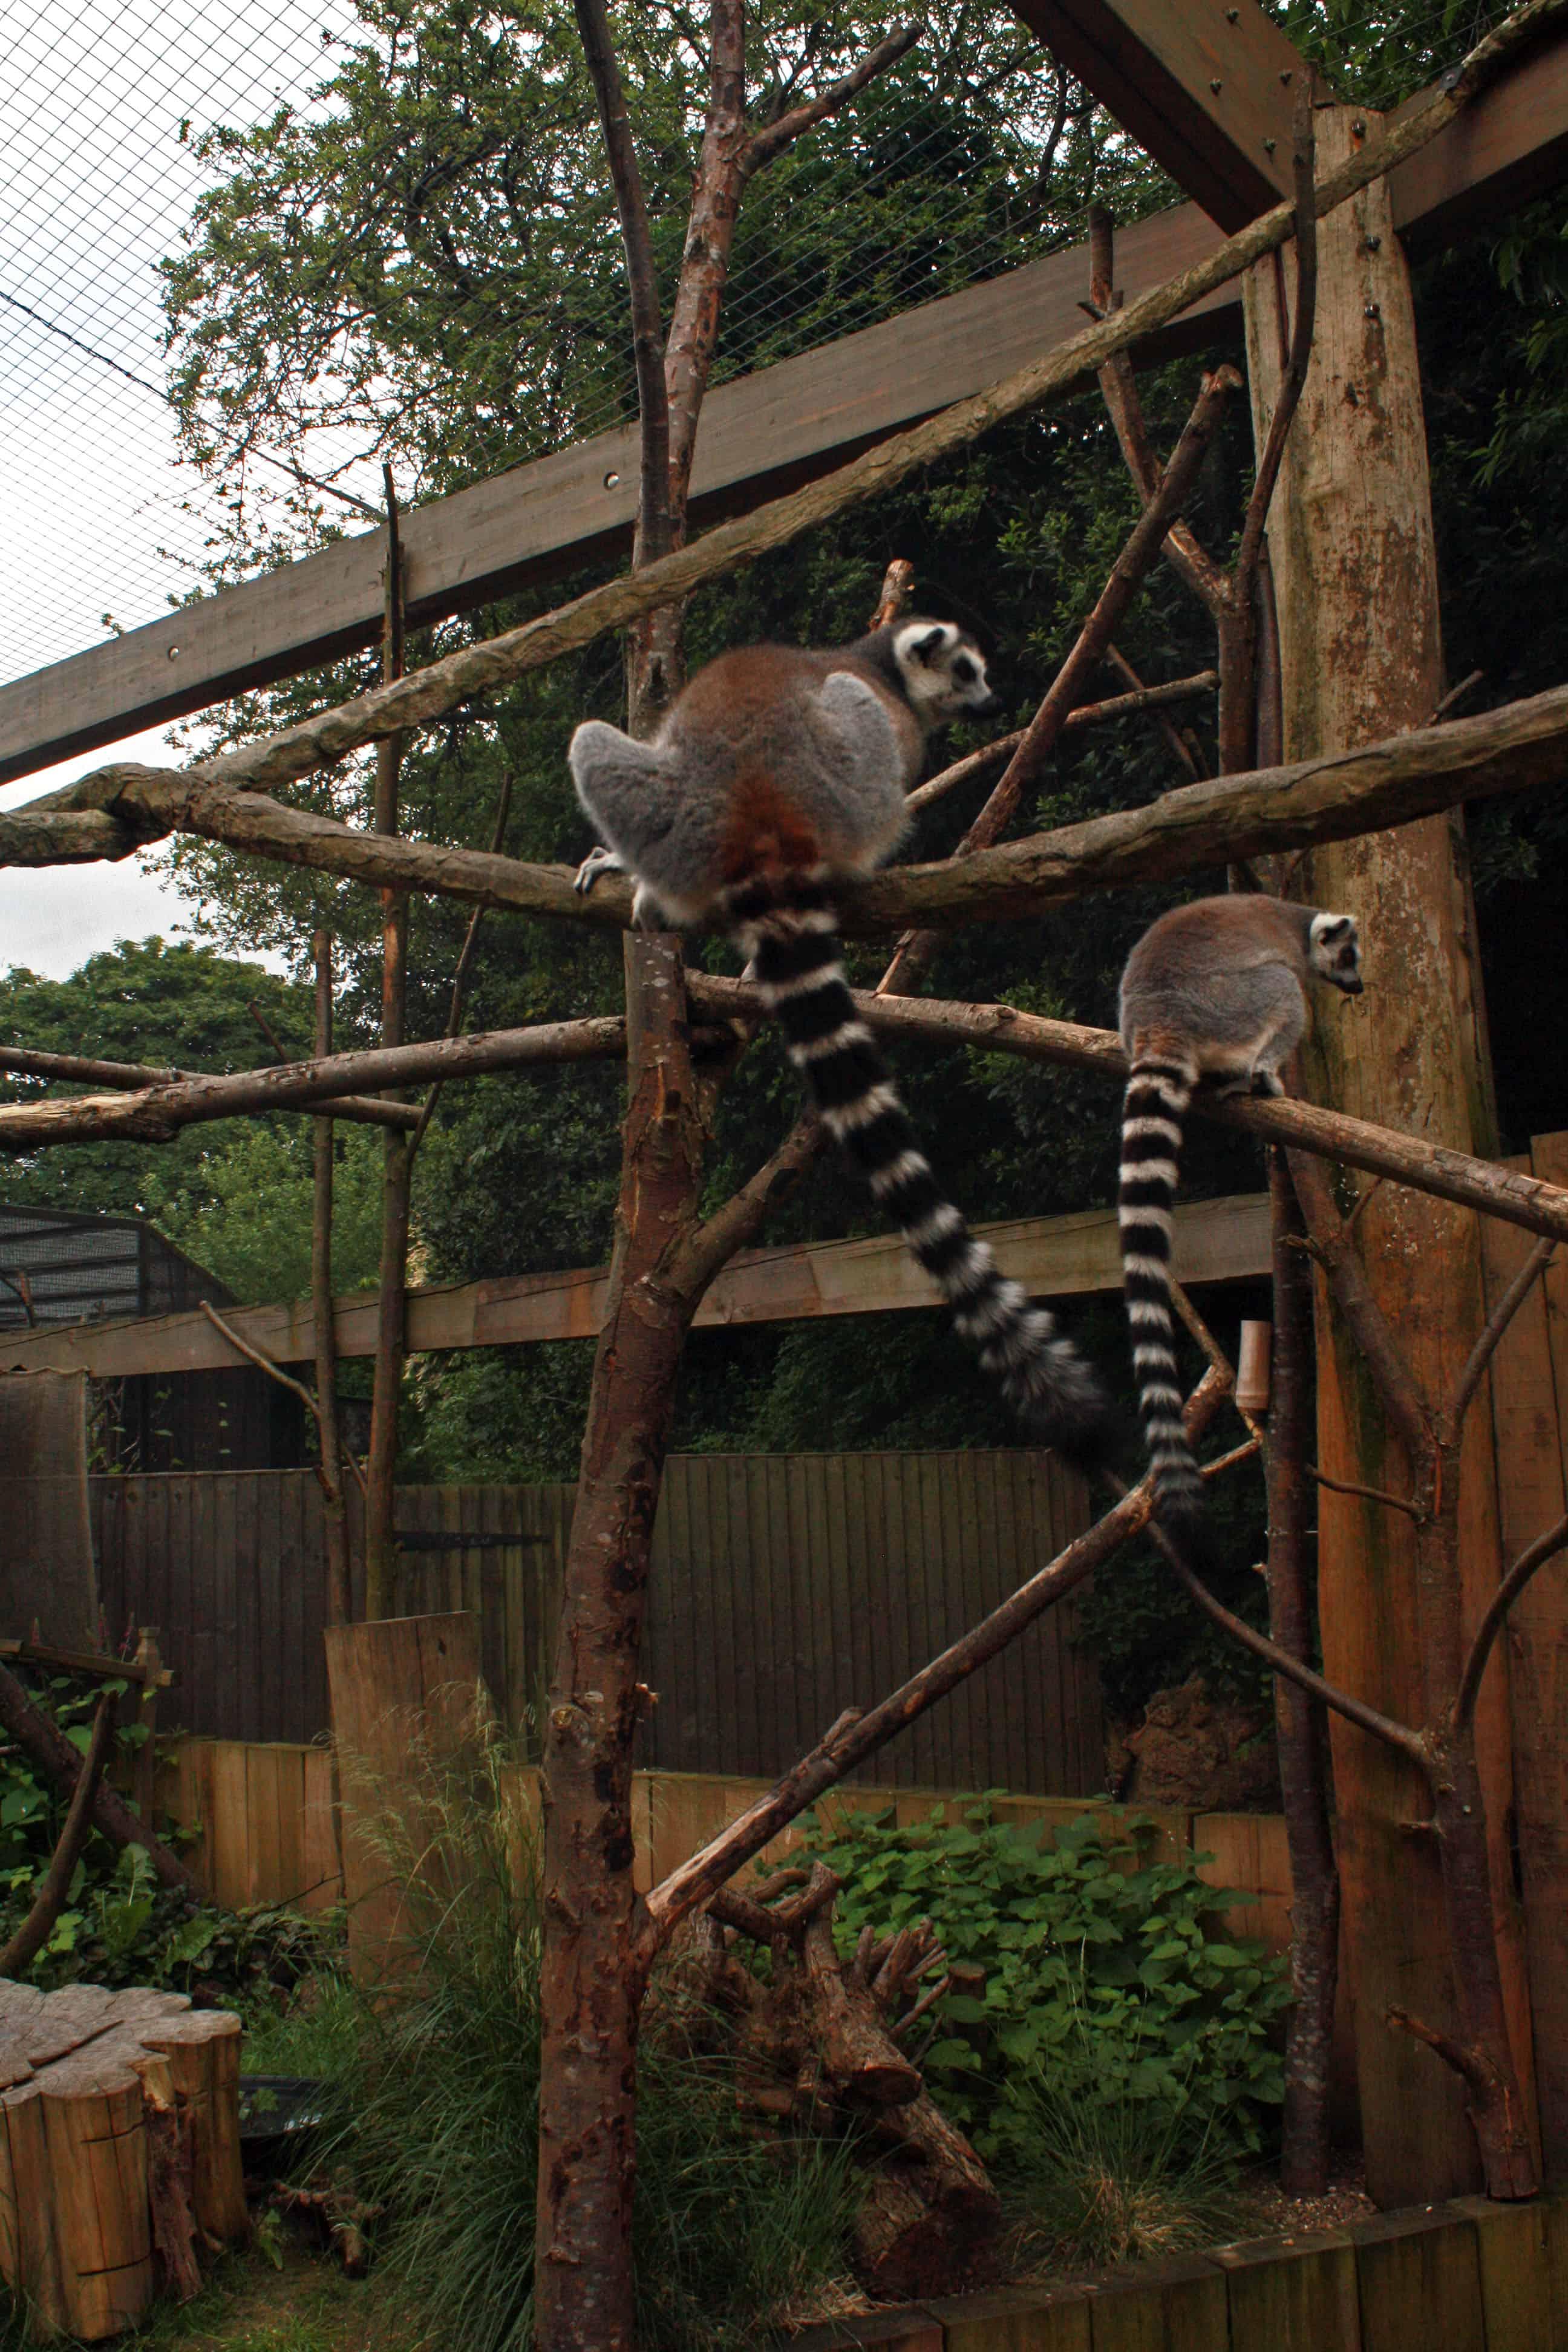 Lemurs at London Zoo